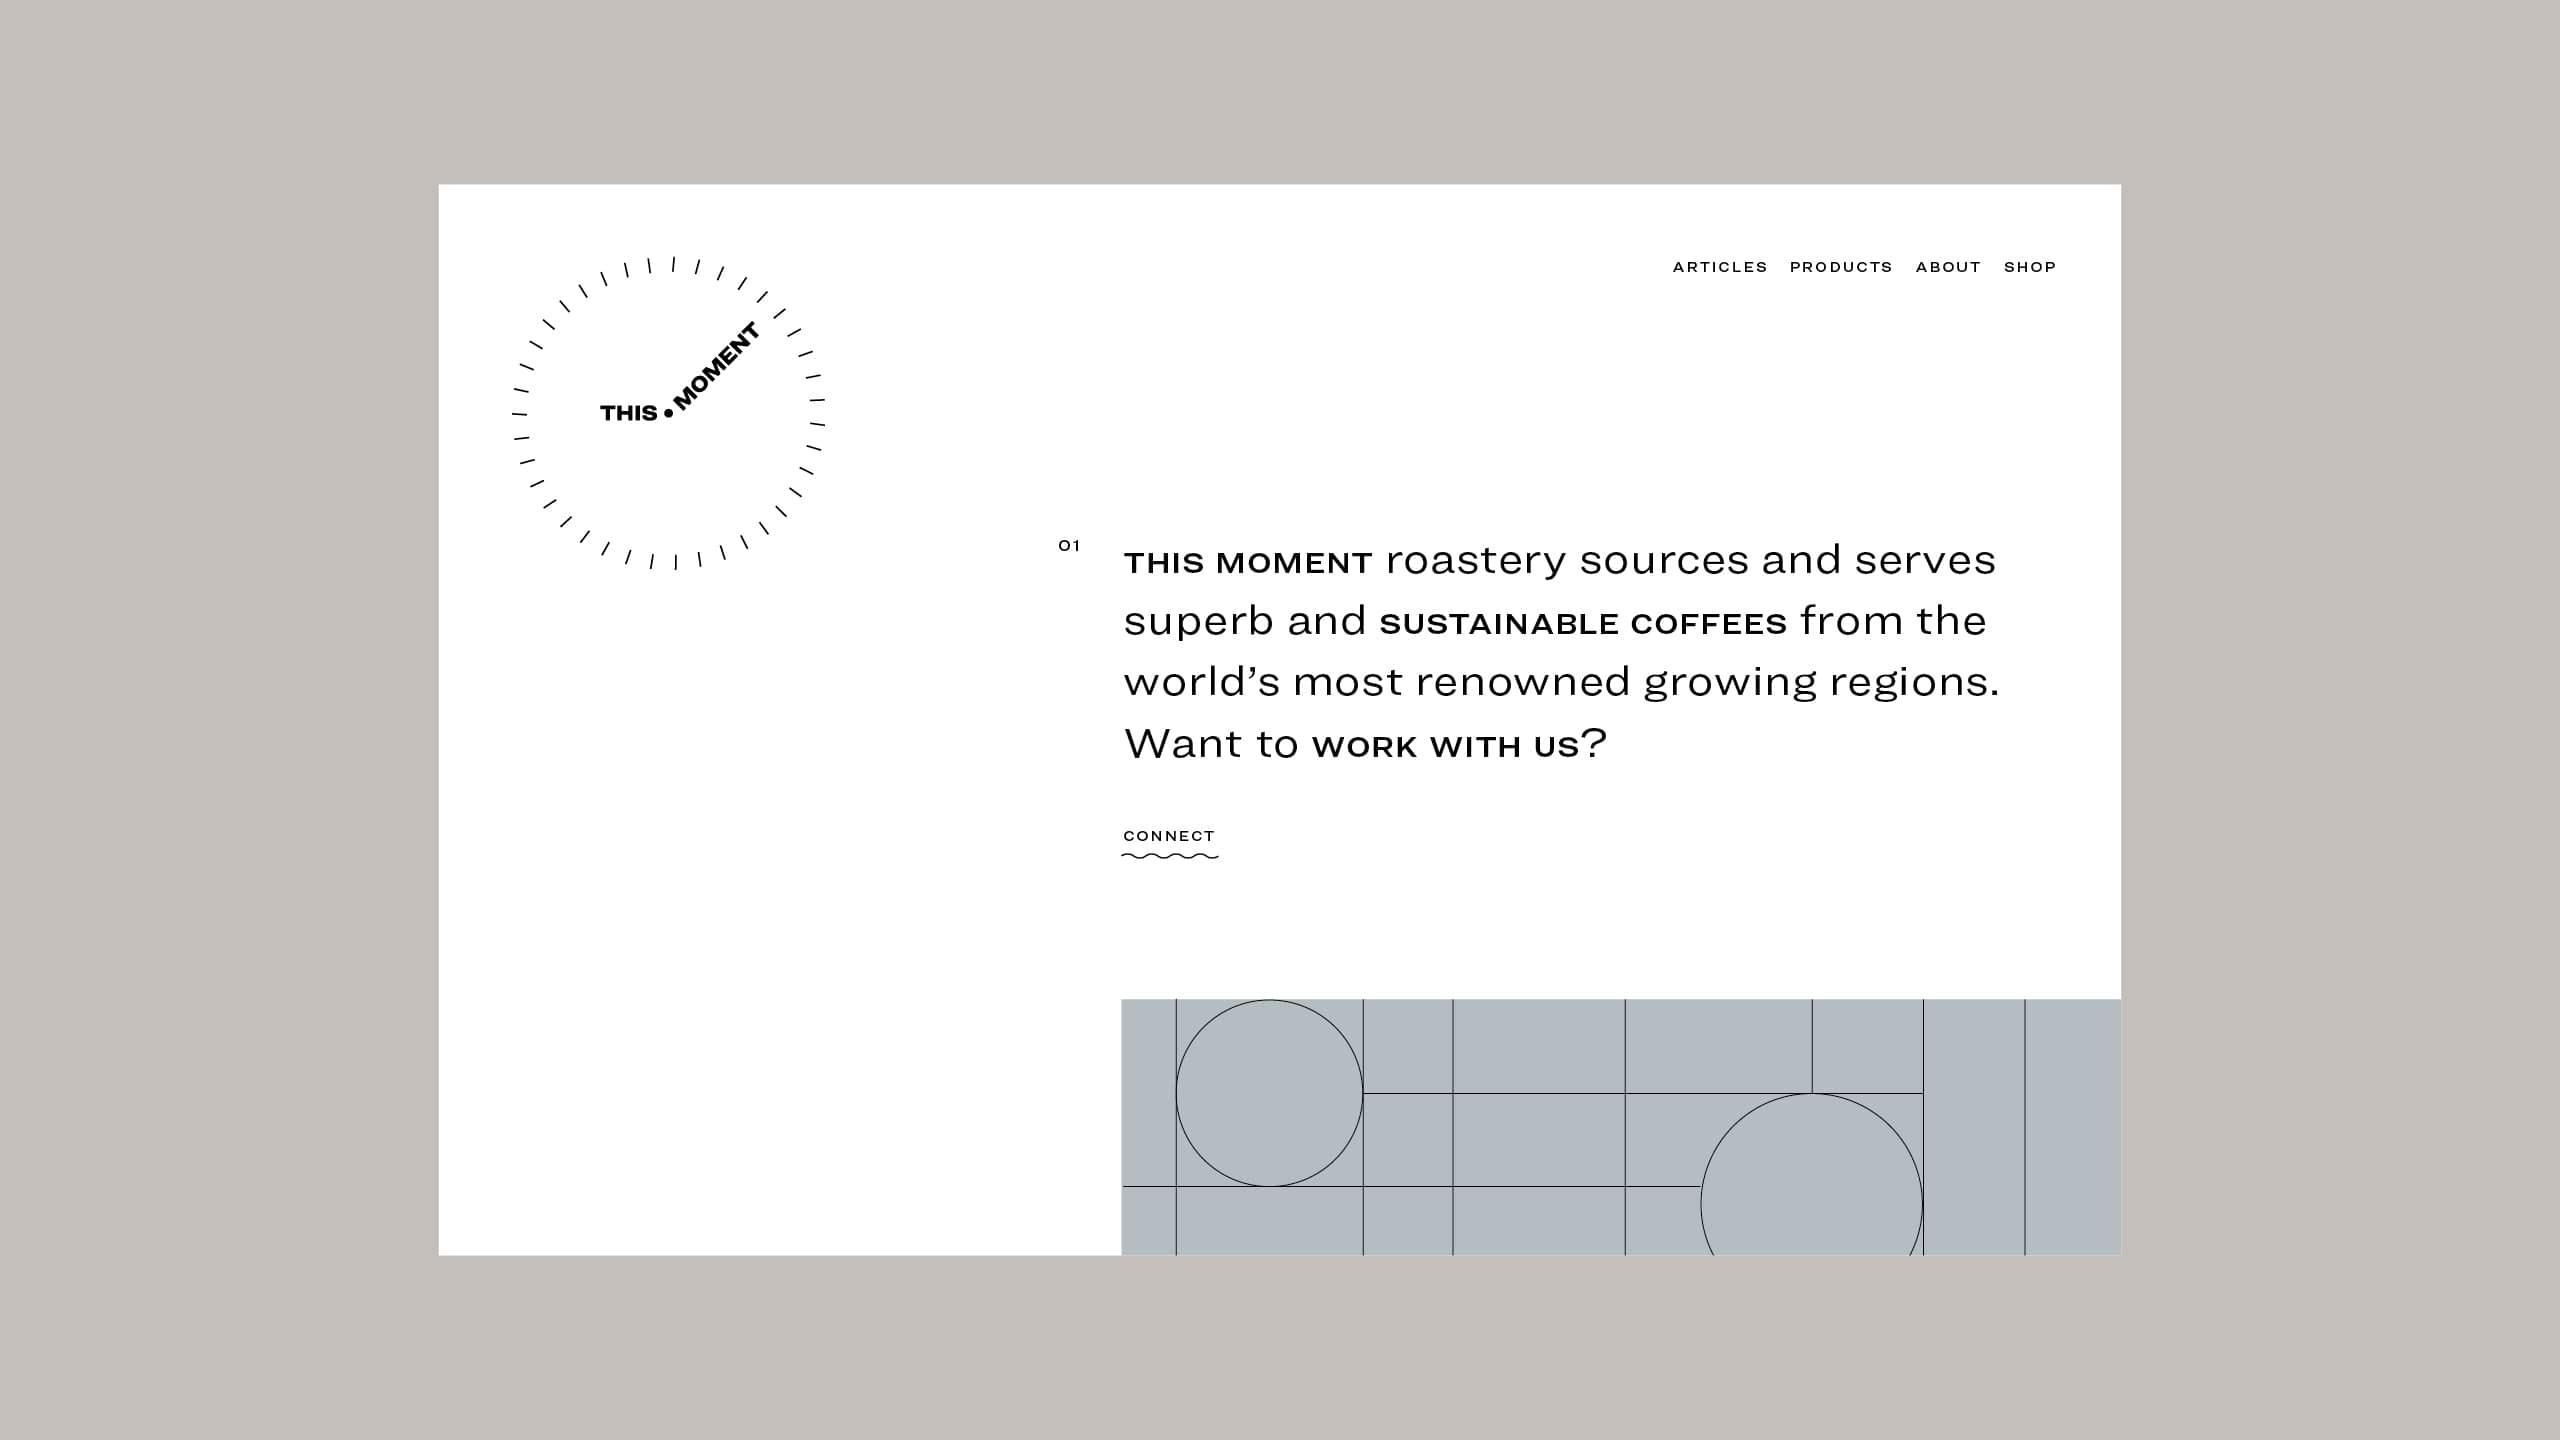 mantik-digital-branding-development-agency-creative-app-ui-web-branding-26-min-1